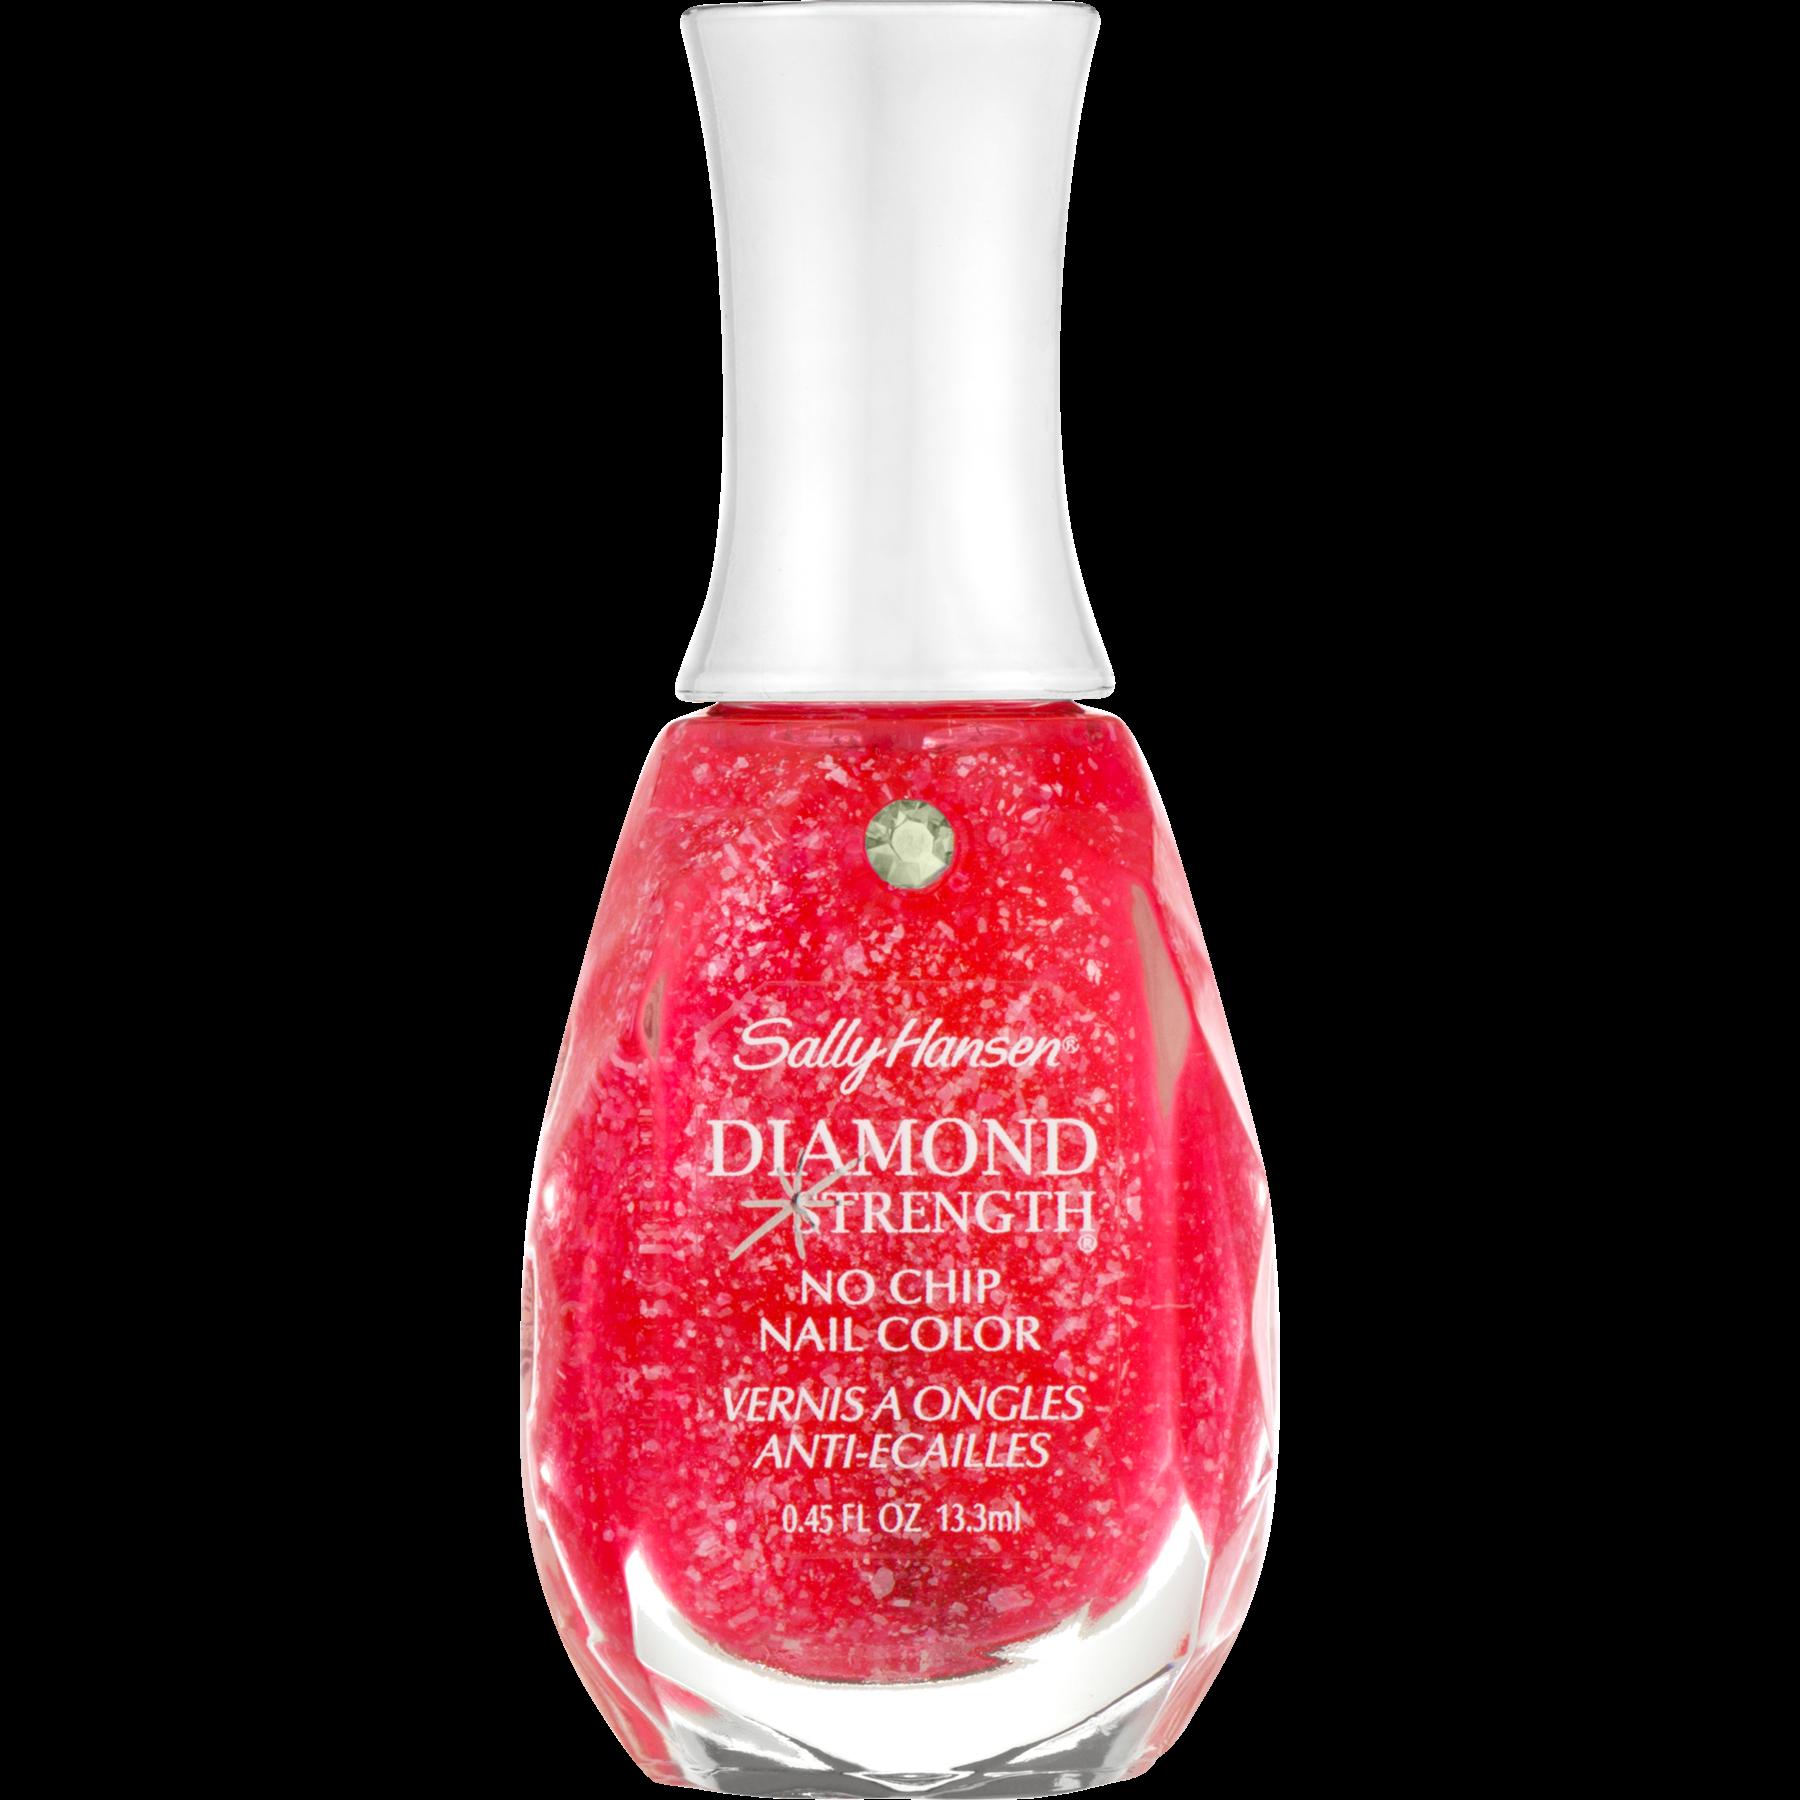 Sally Hansen Diamond Strength No Chip Nail Color, 0.45 fl oz ...